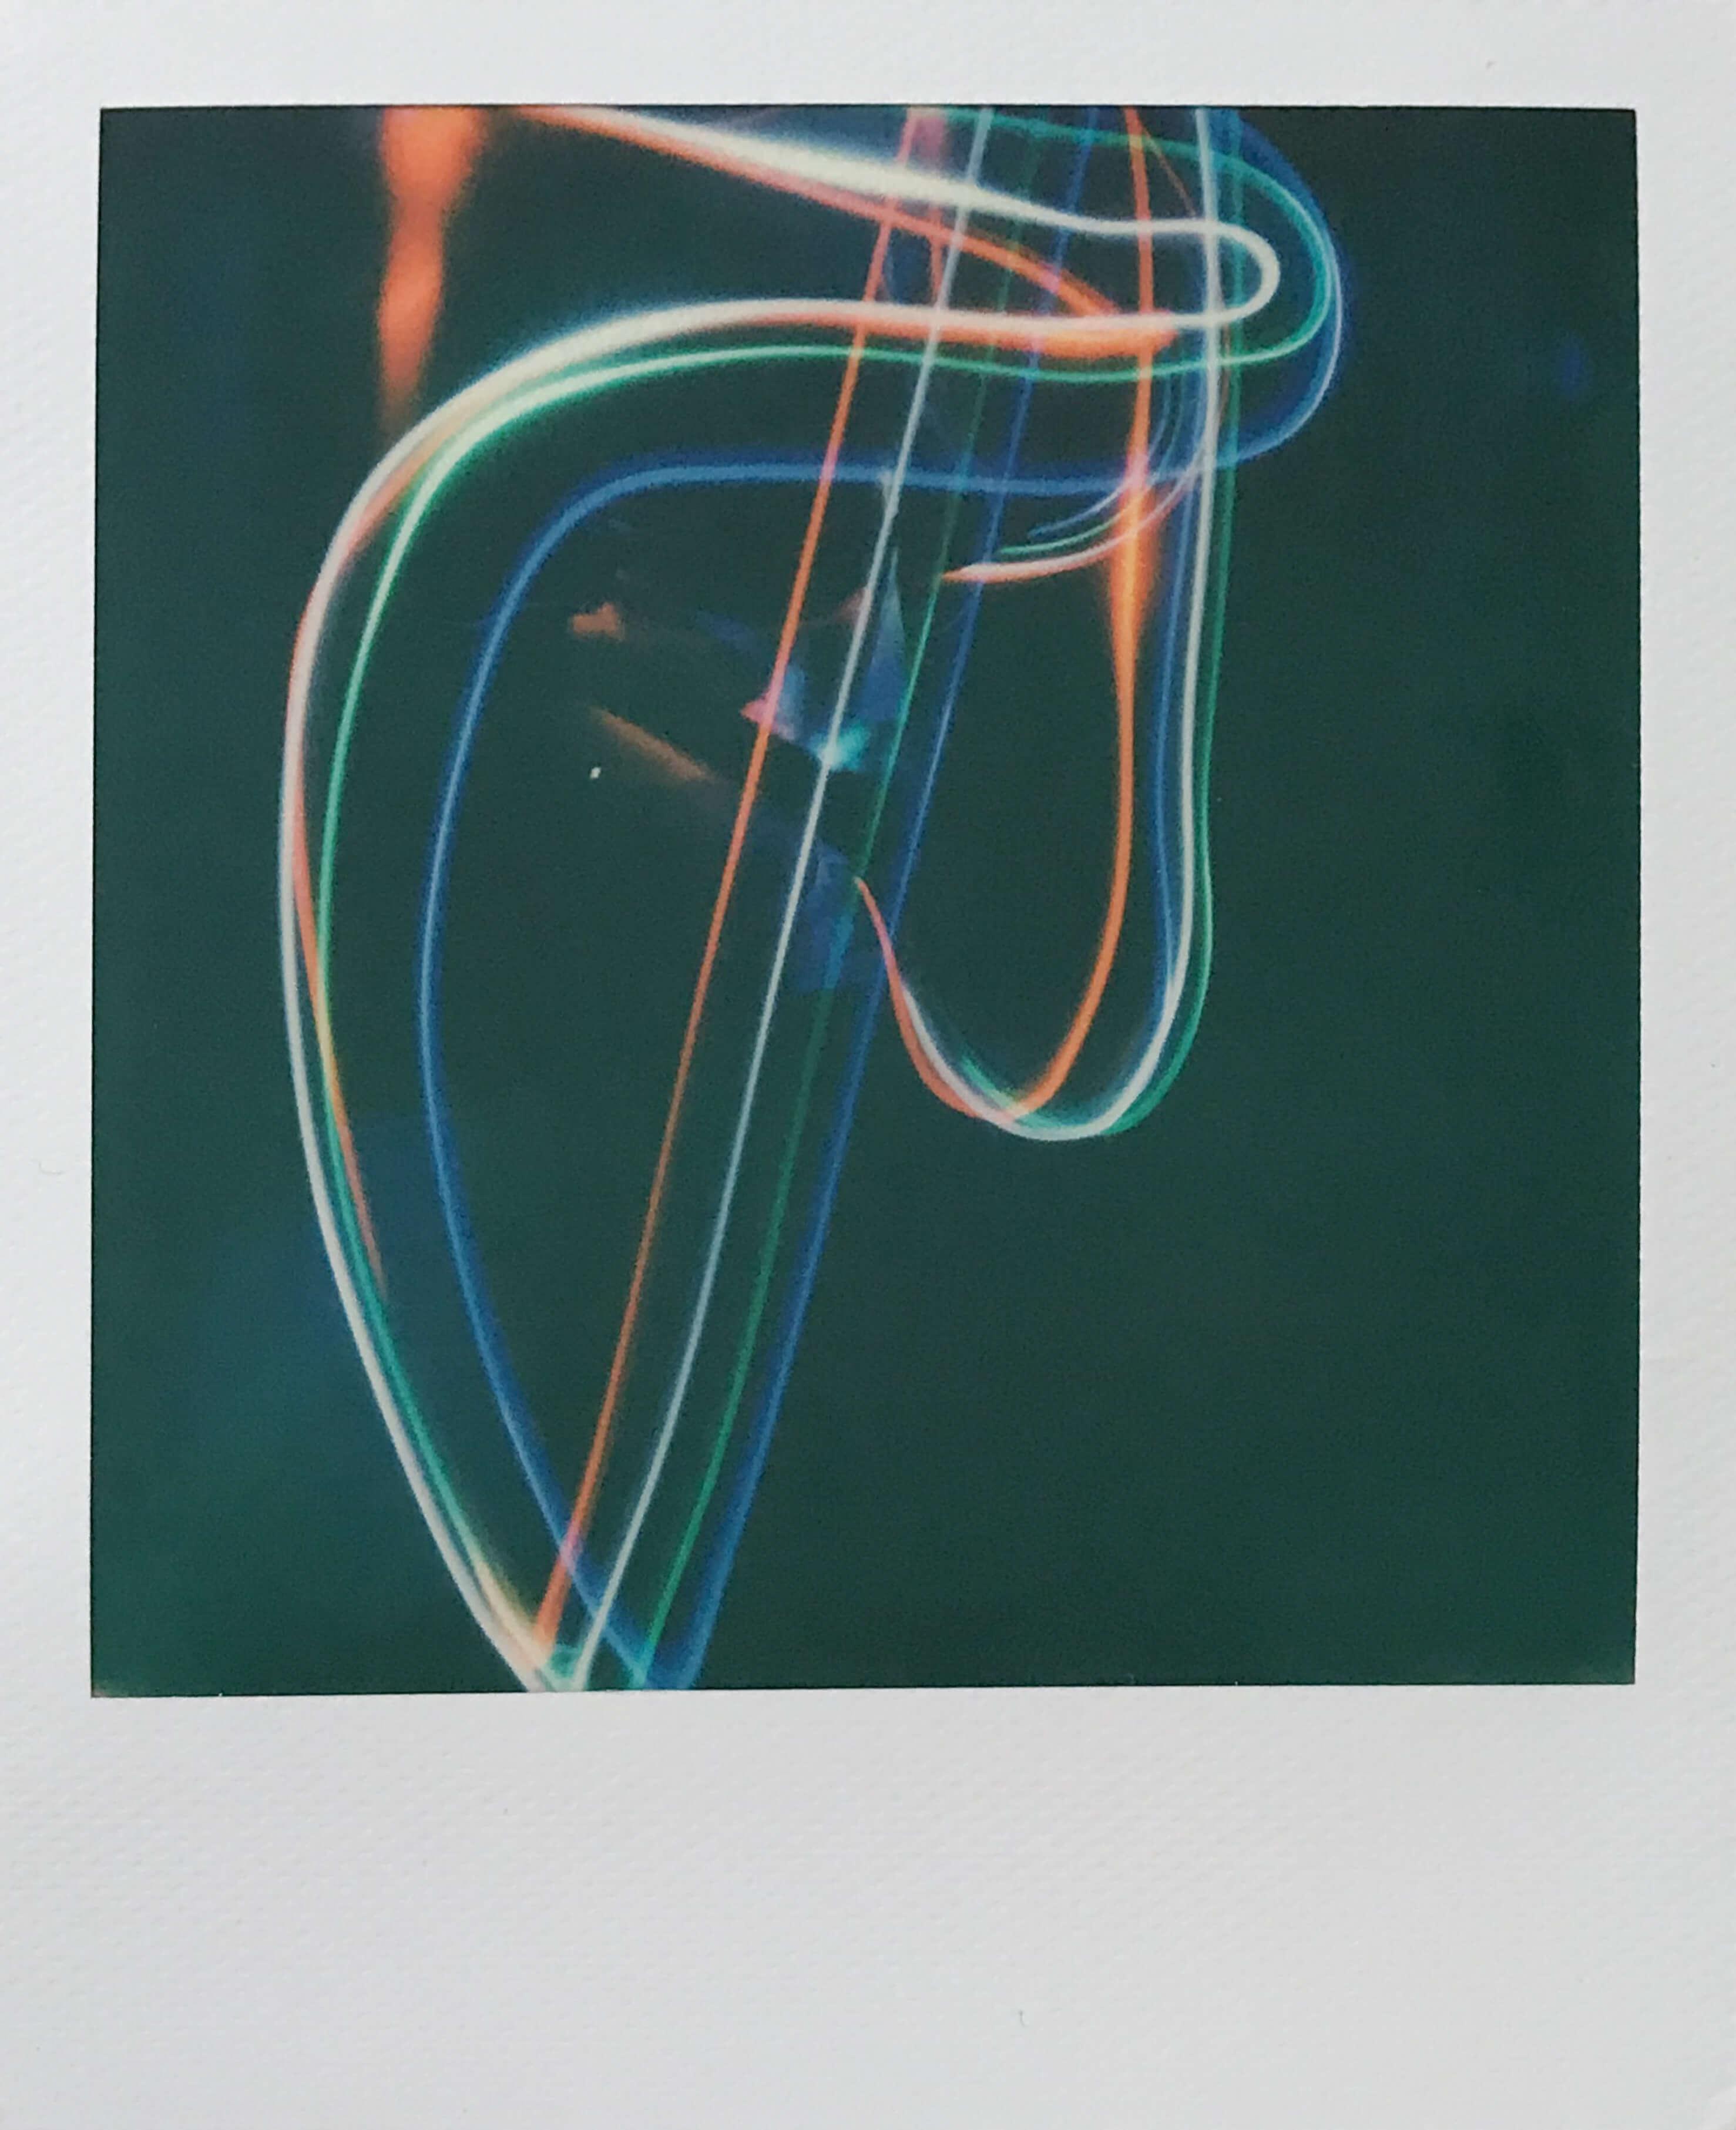 Polaroid of light painting